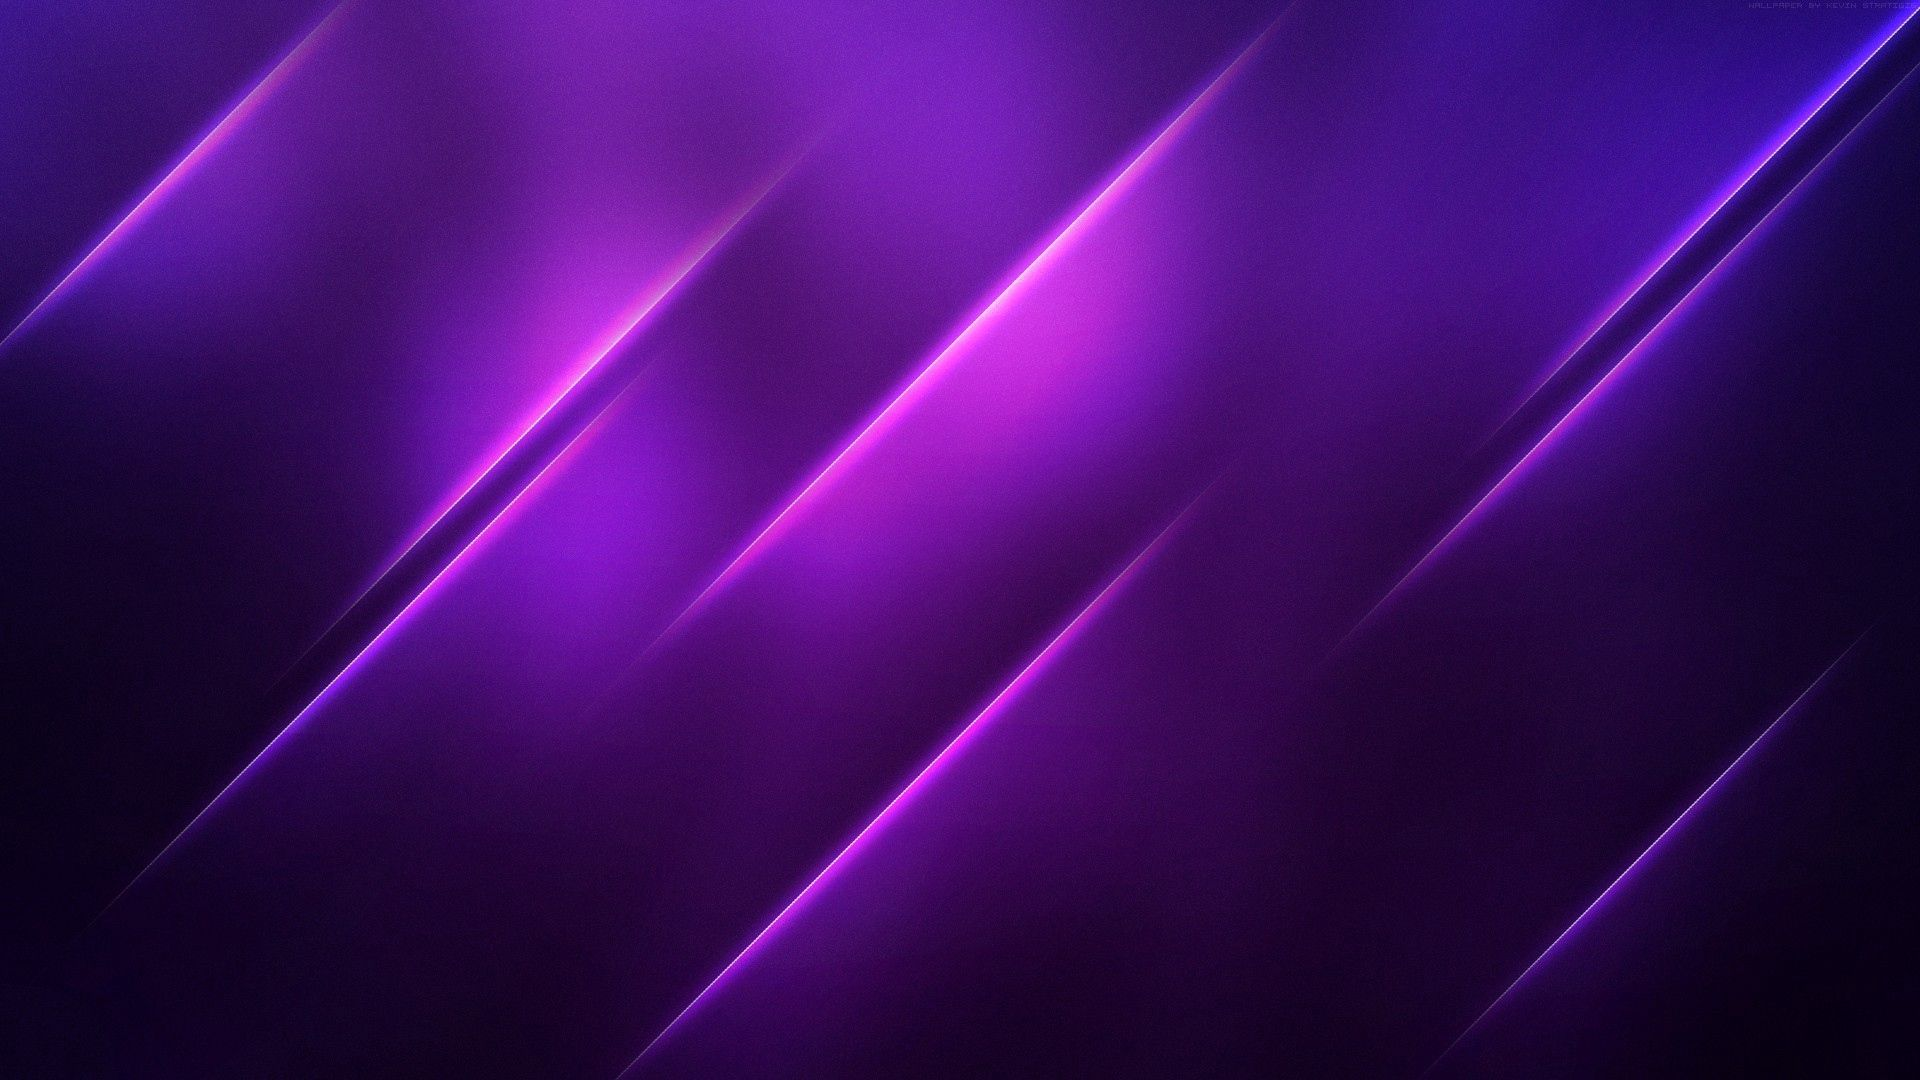 Purple And White screen wallpaper